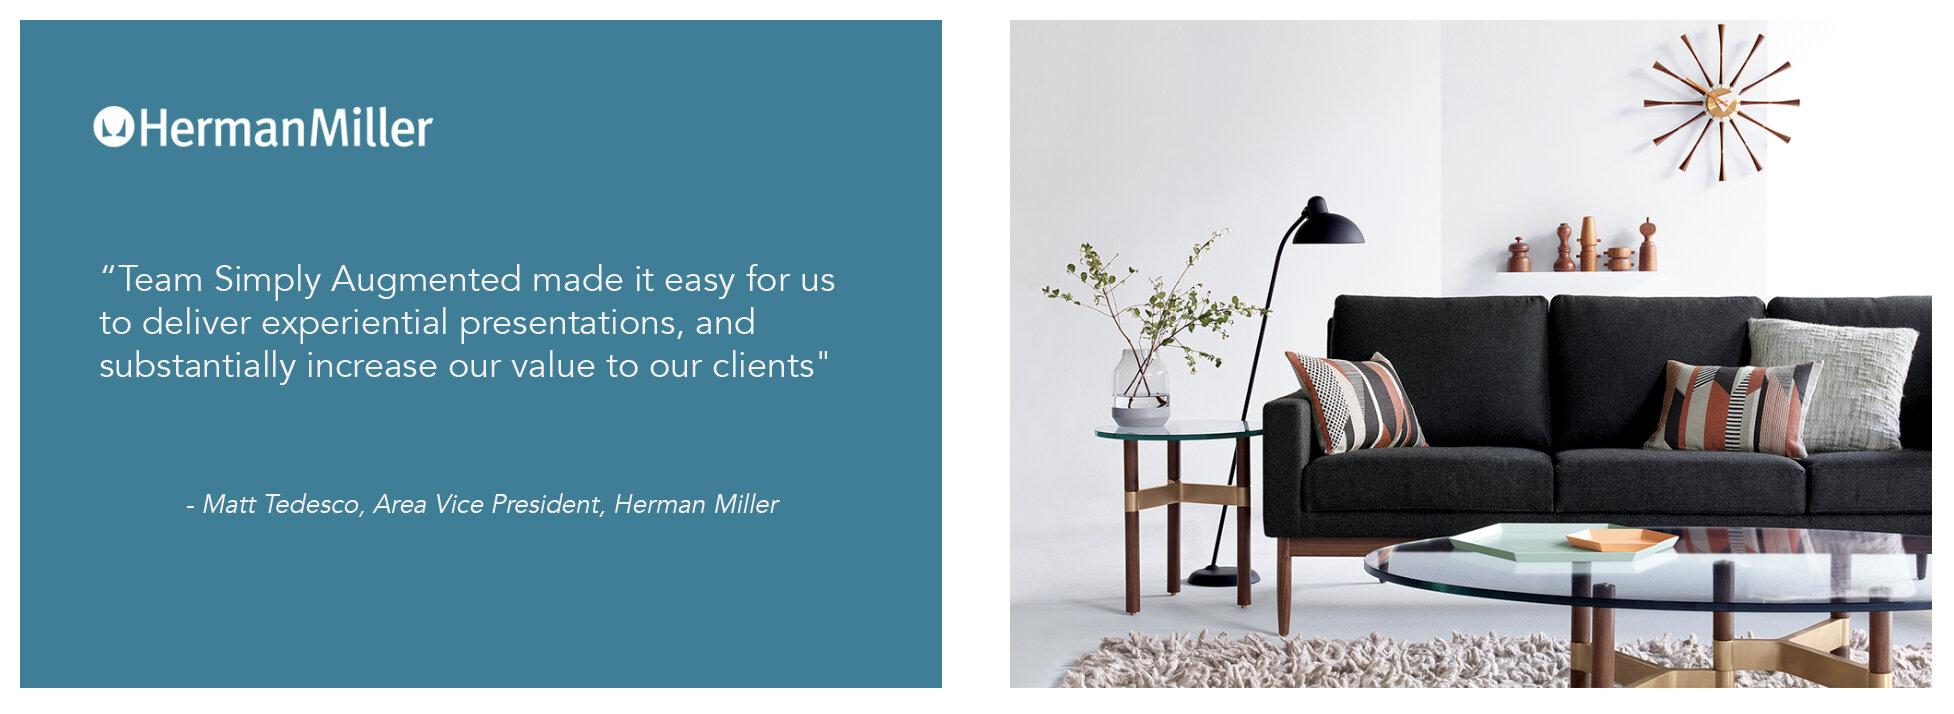 Quote-HermanMiller.jpg